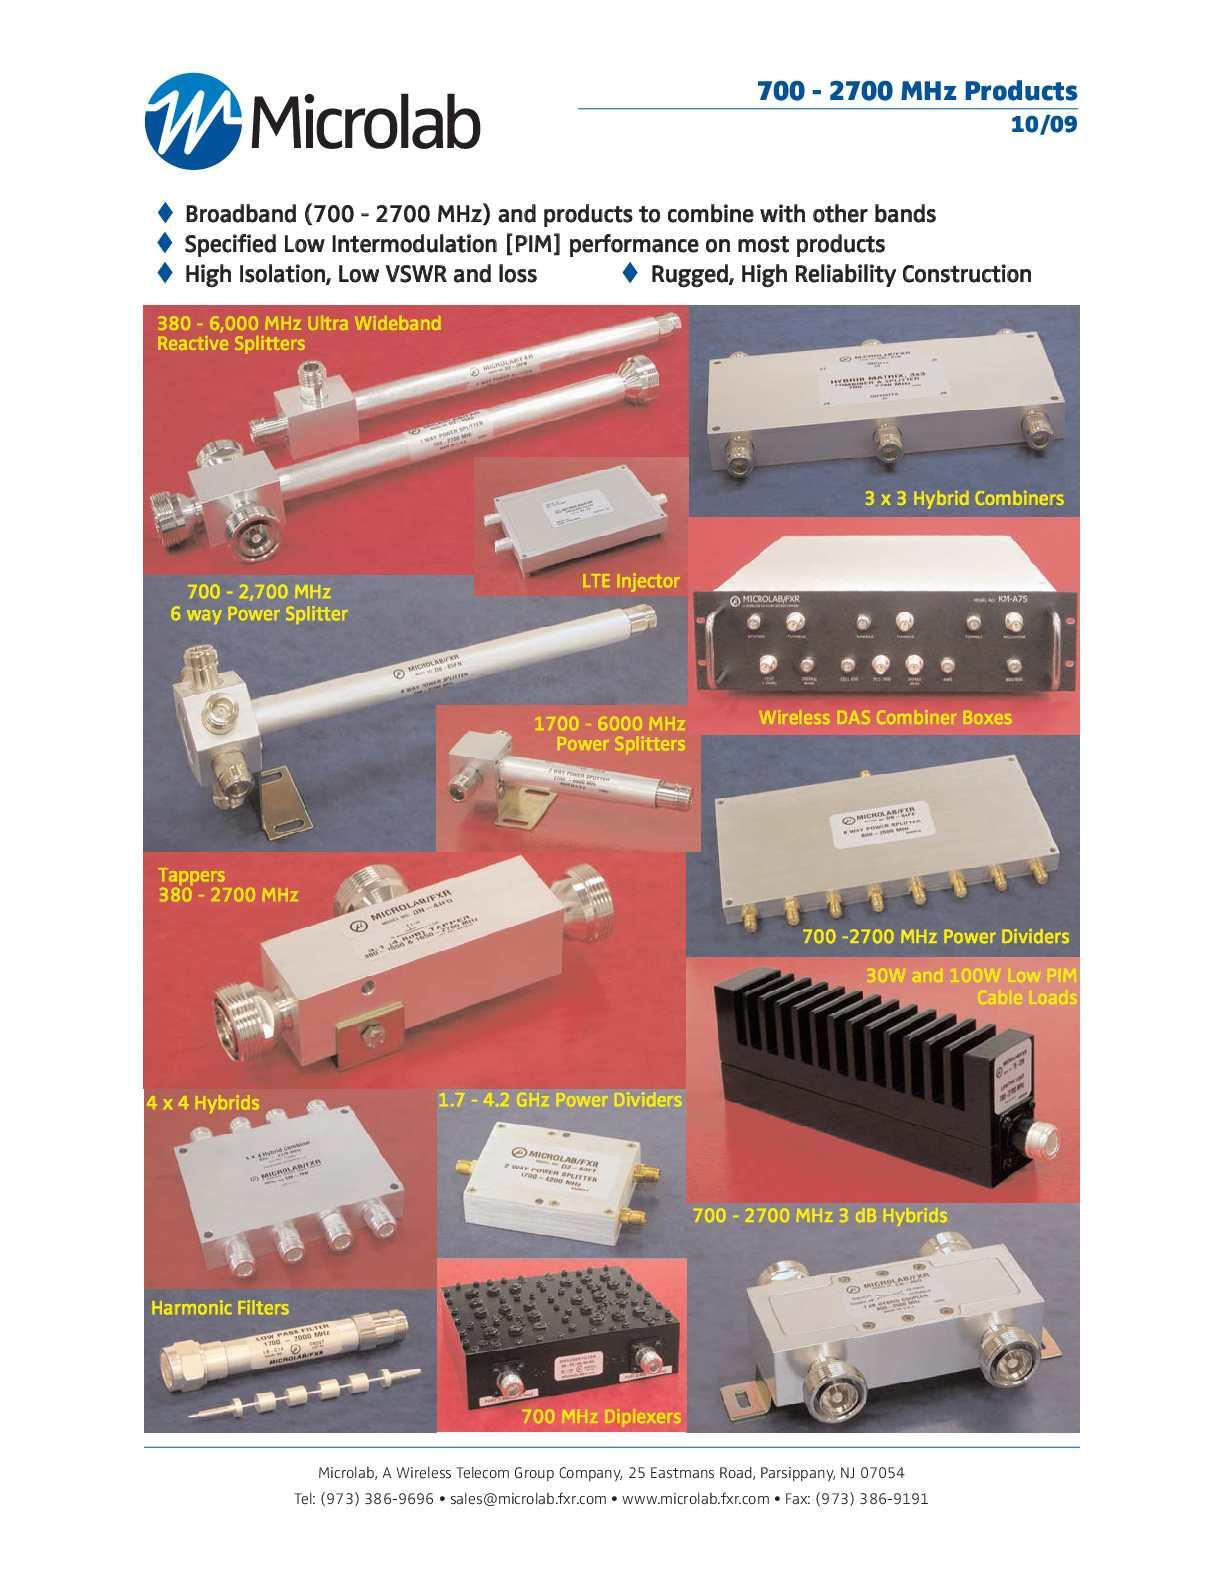 MICROLAB//FXR CM-81N HYBRID MATRIX 3*3 700-2700 MHz